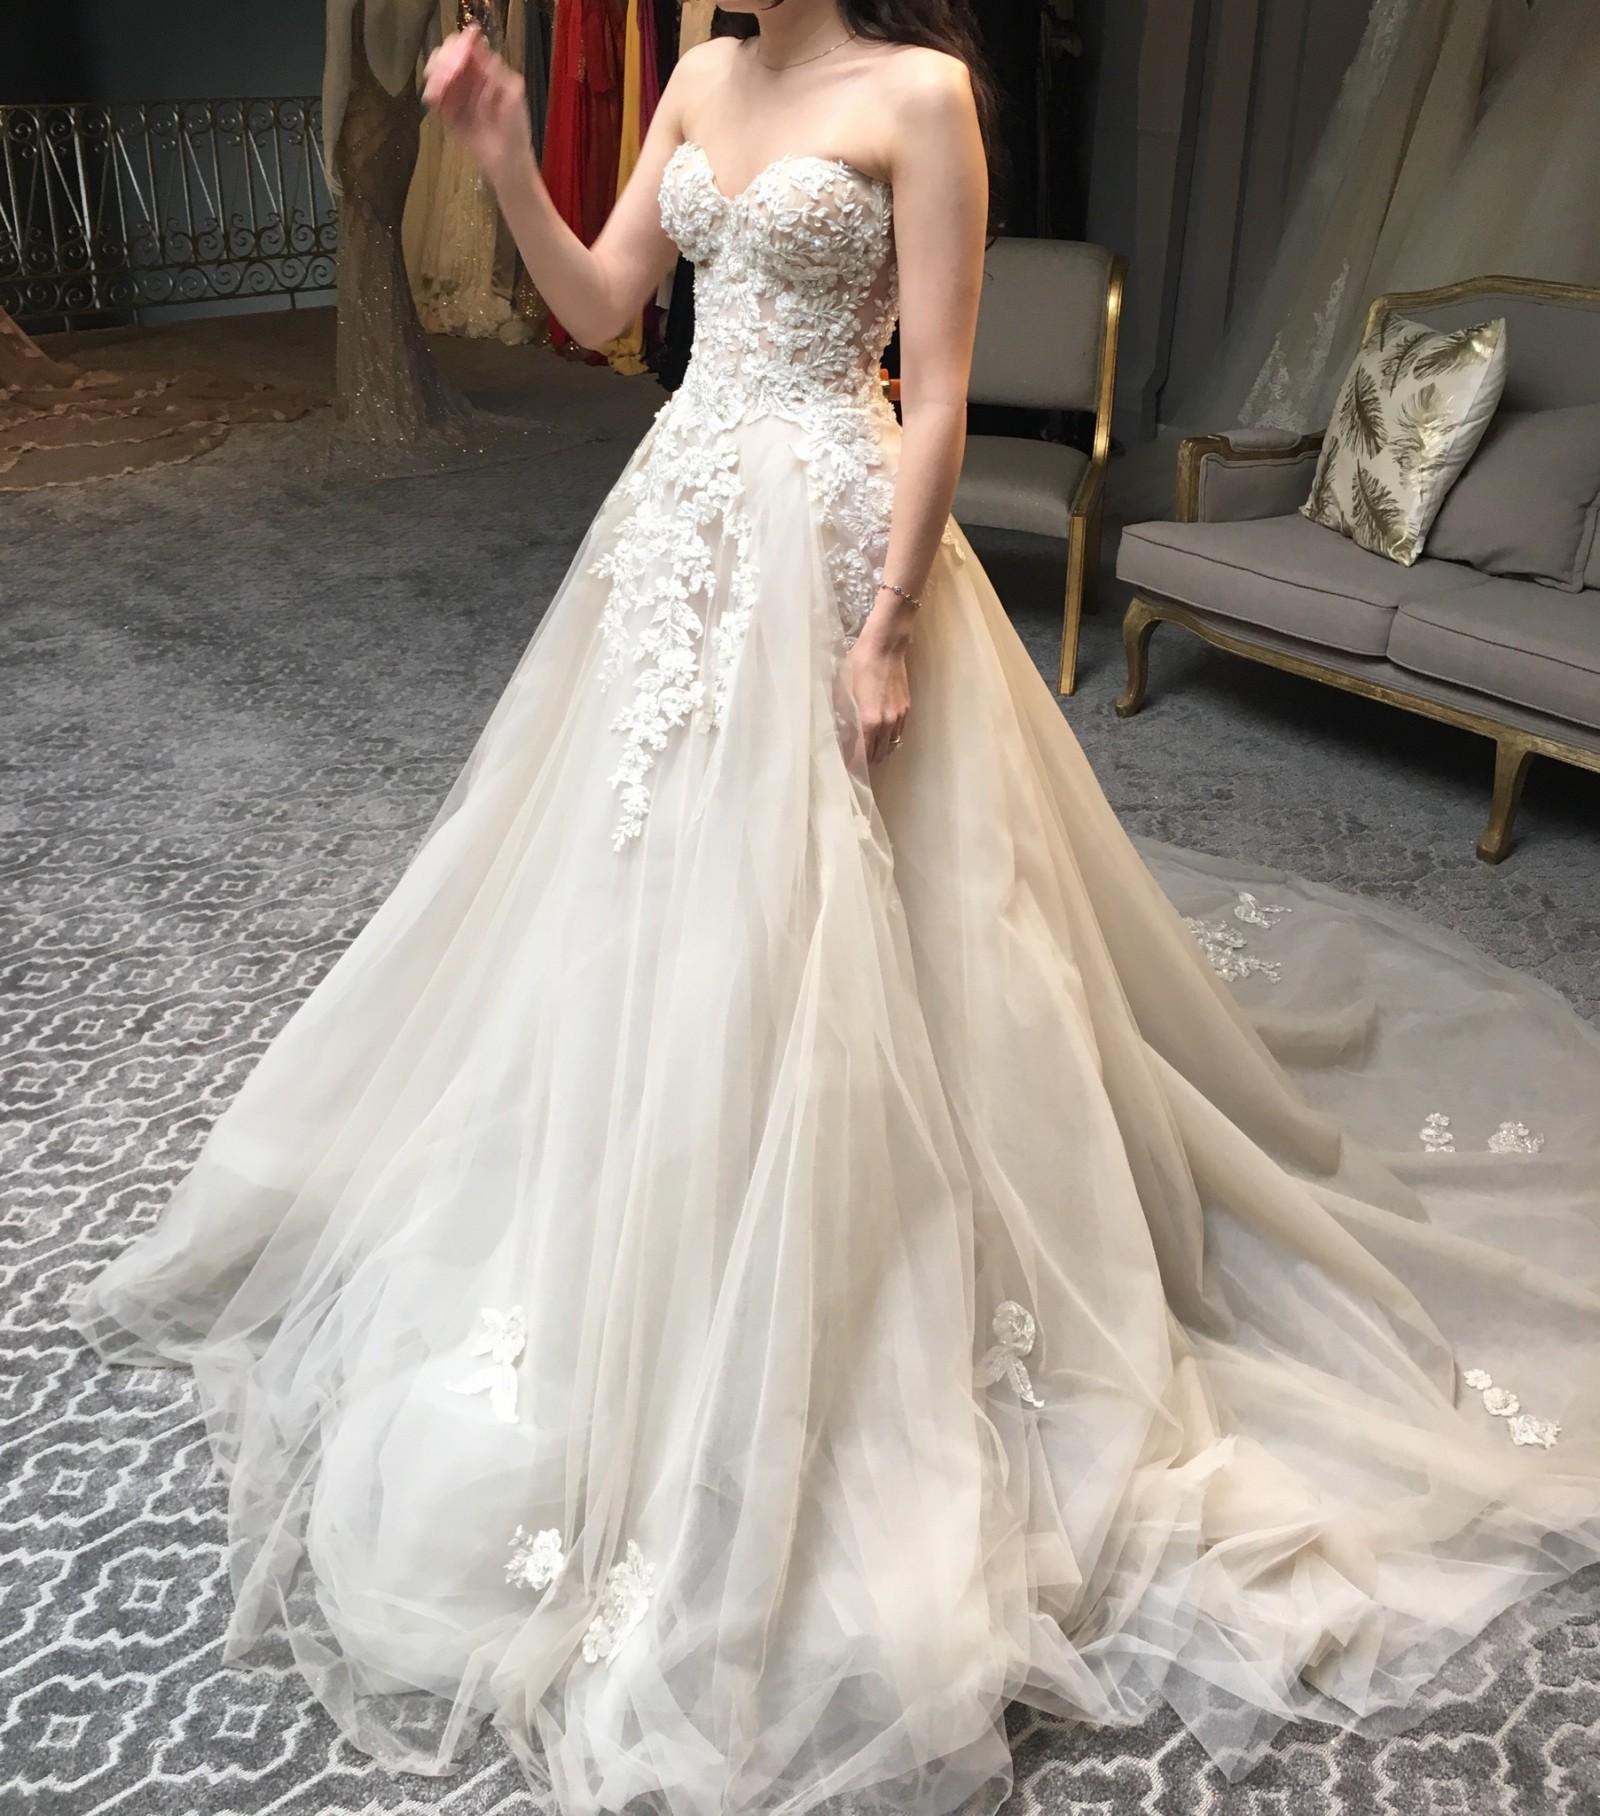 Galia Lahav Gia Preowned Wedding Dress On Sale 43% Off